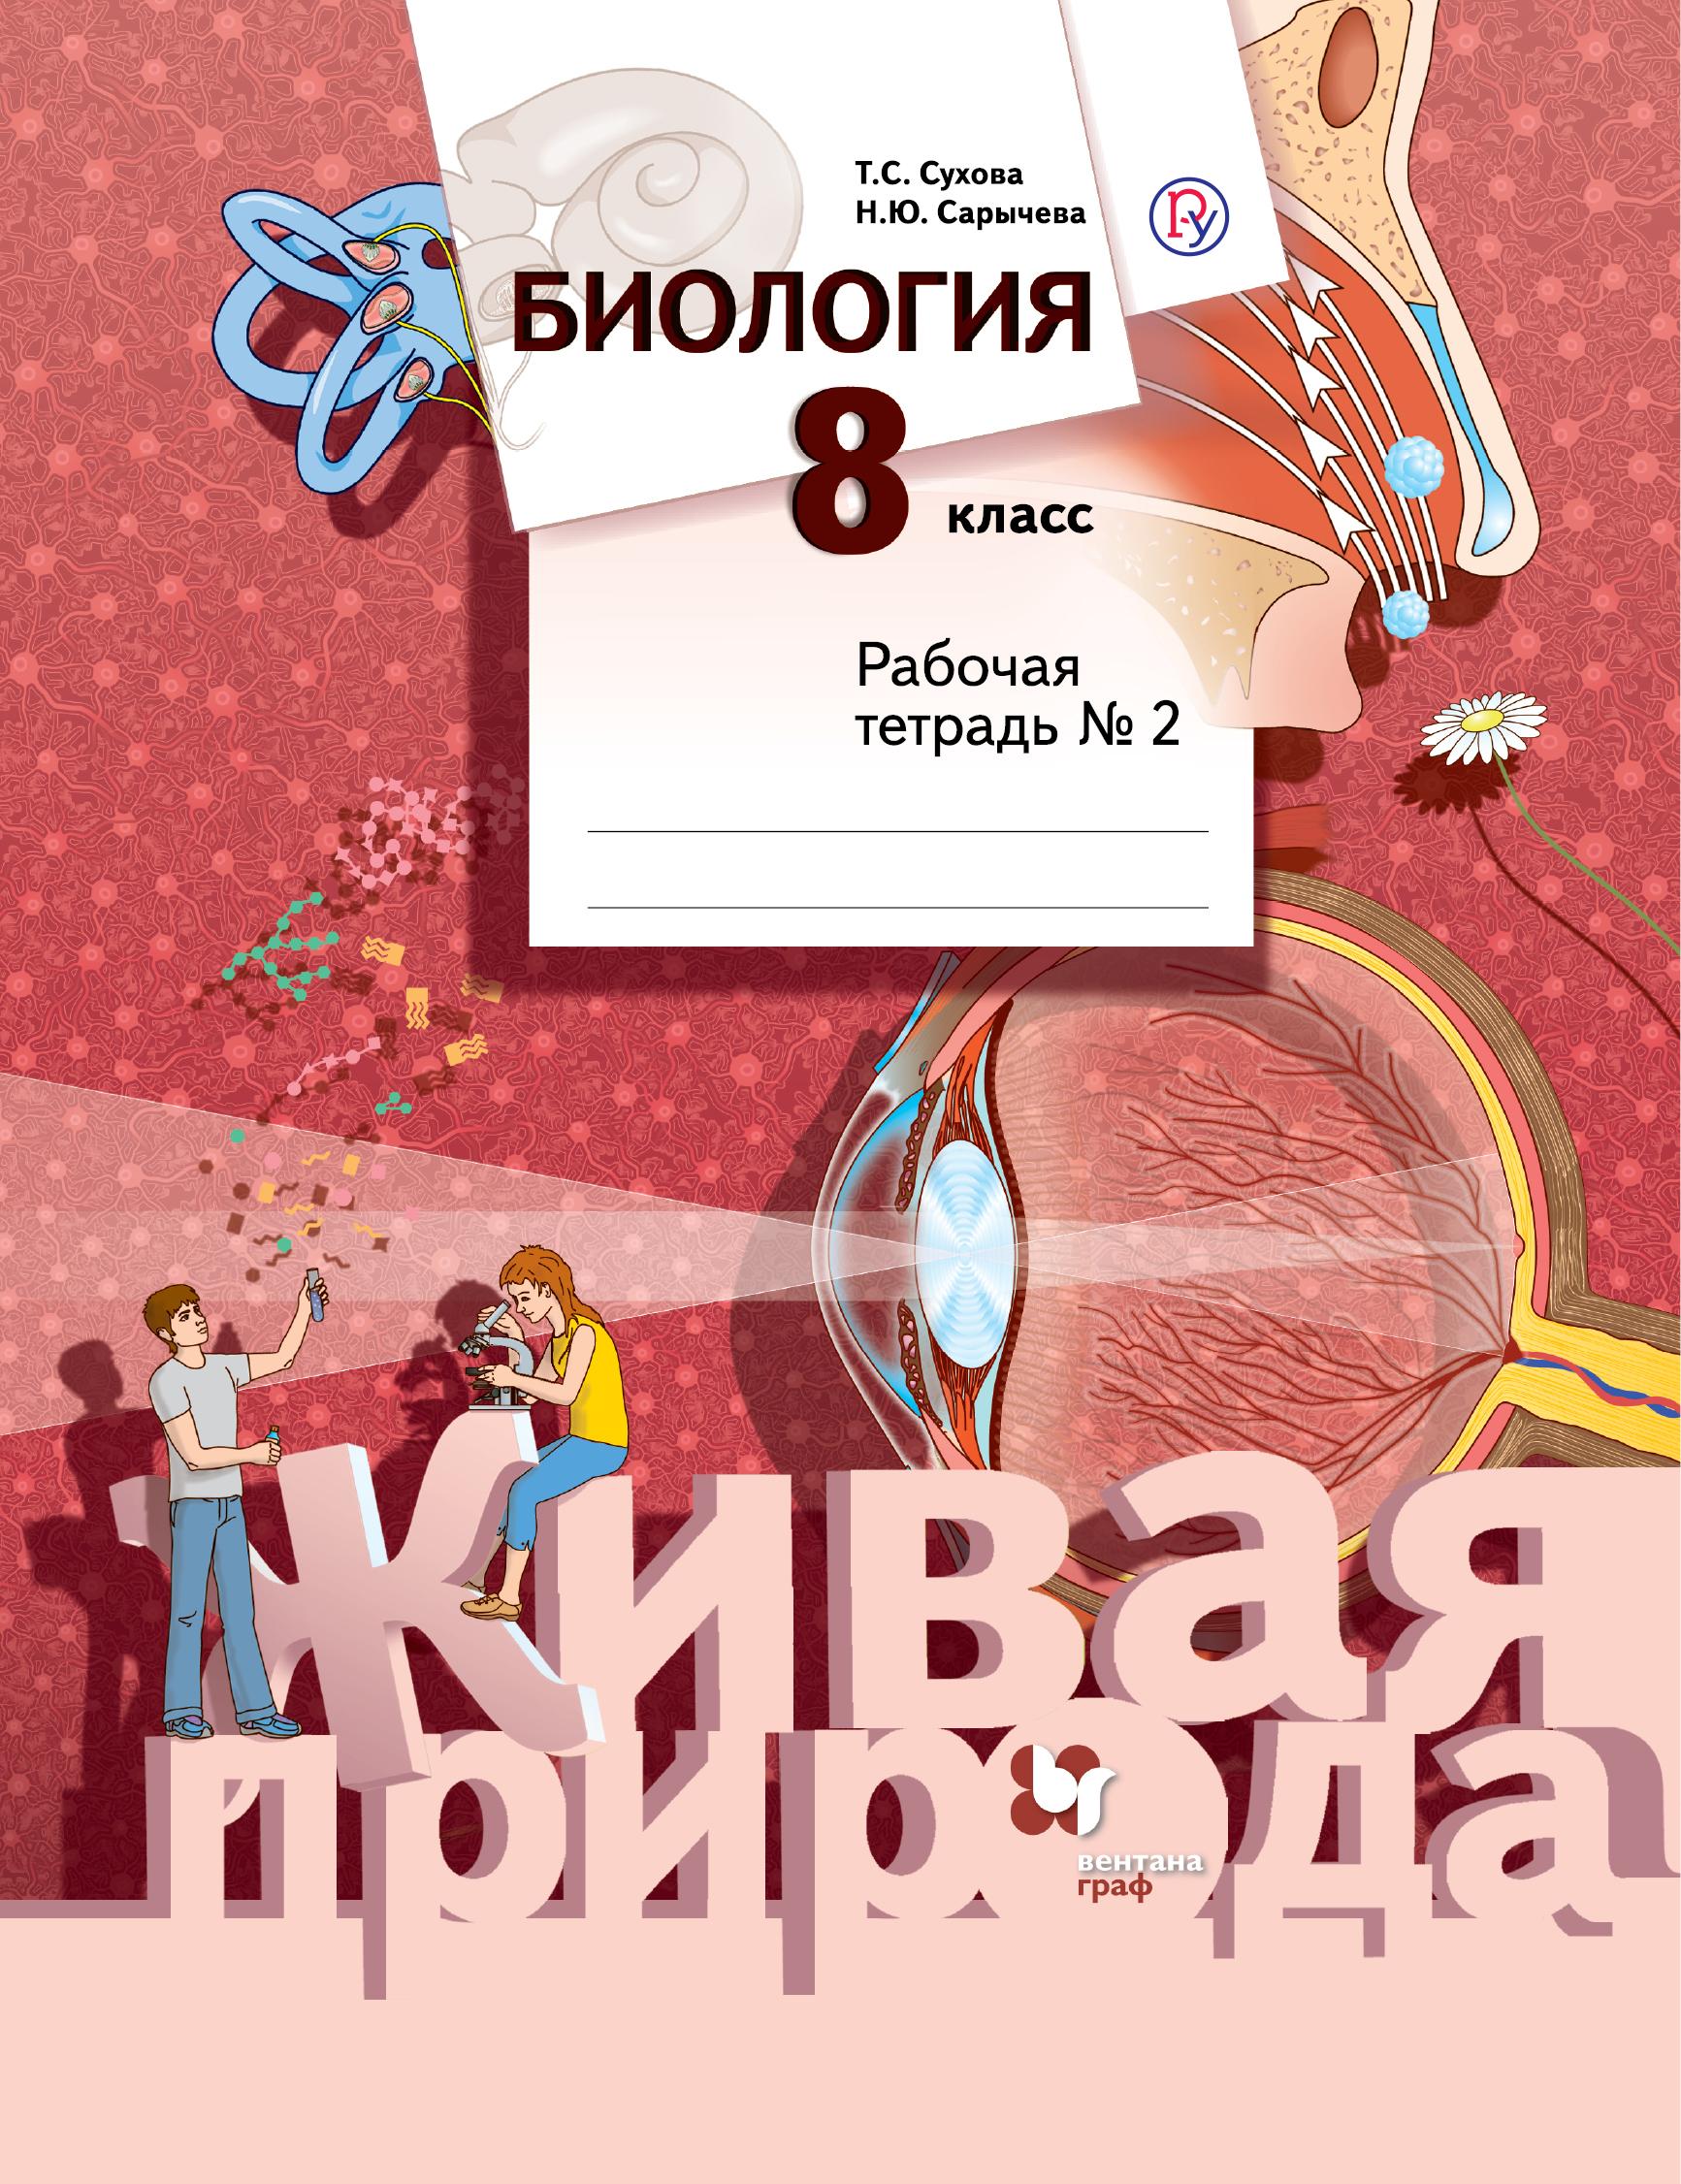 Биология. 8 класс. Рабочая тетрадь №2 ( Сухова Т.С., Сарычева Н.Ю.  )